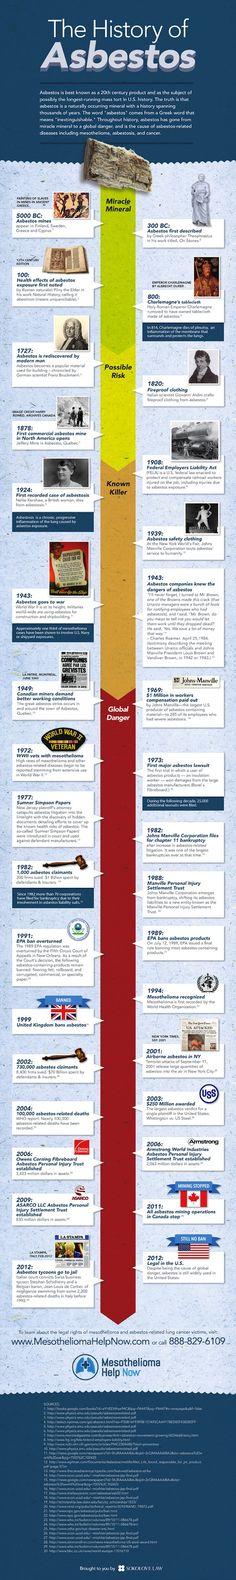 Asbestos Timeline | Mesothelioma Help Now